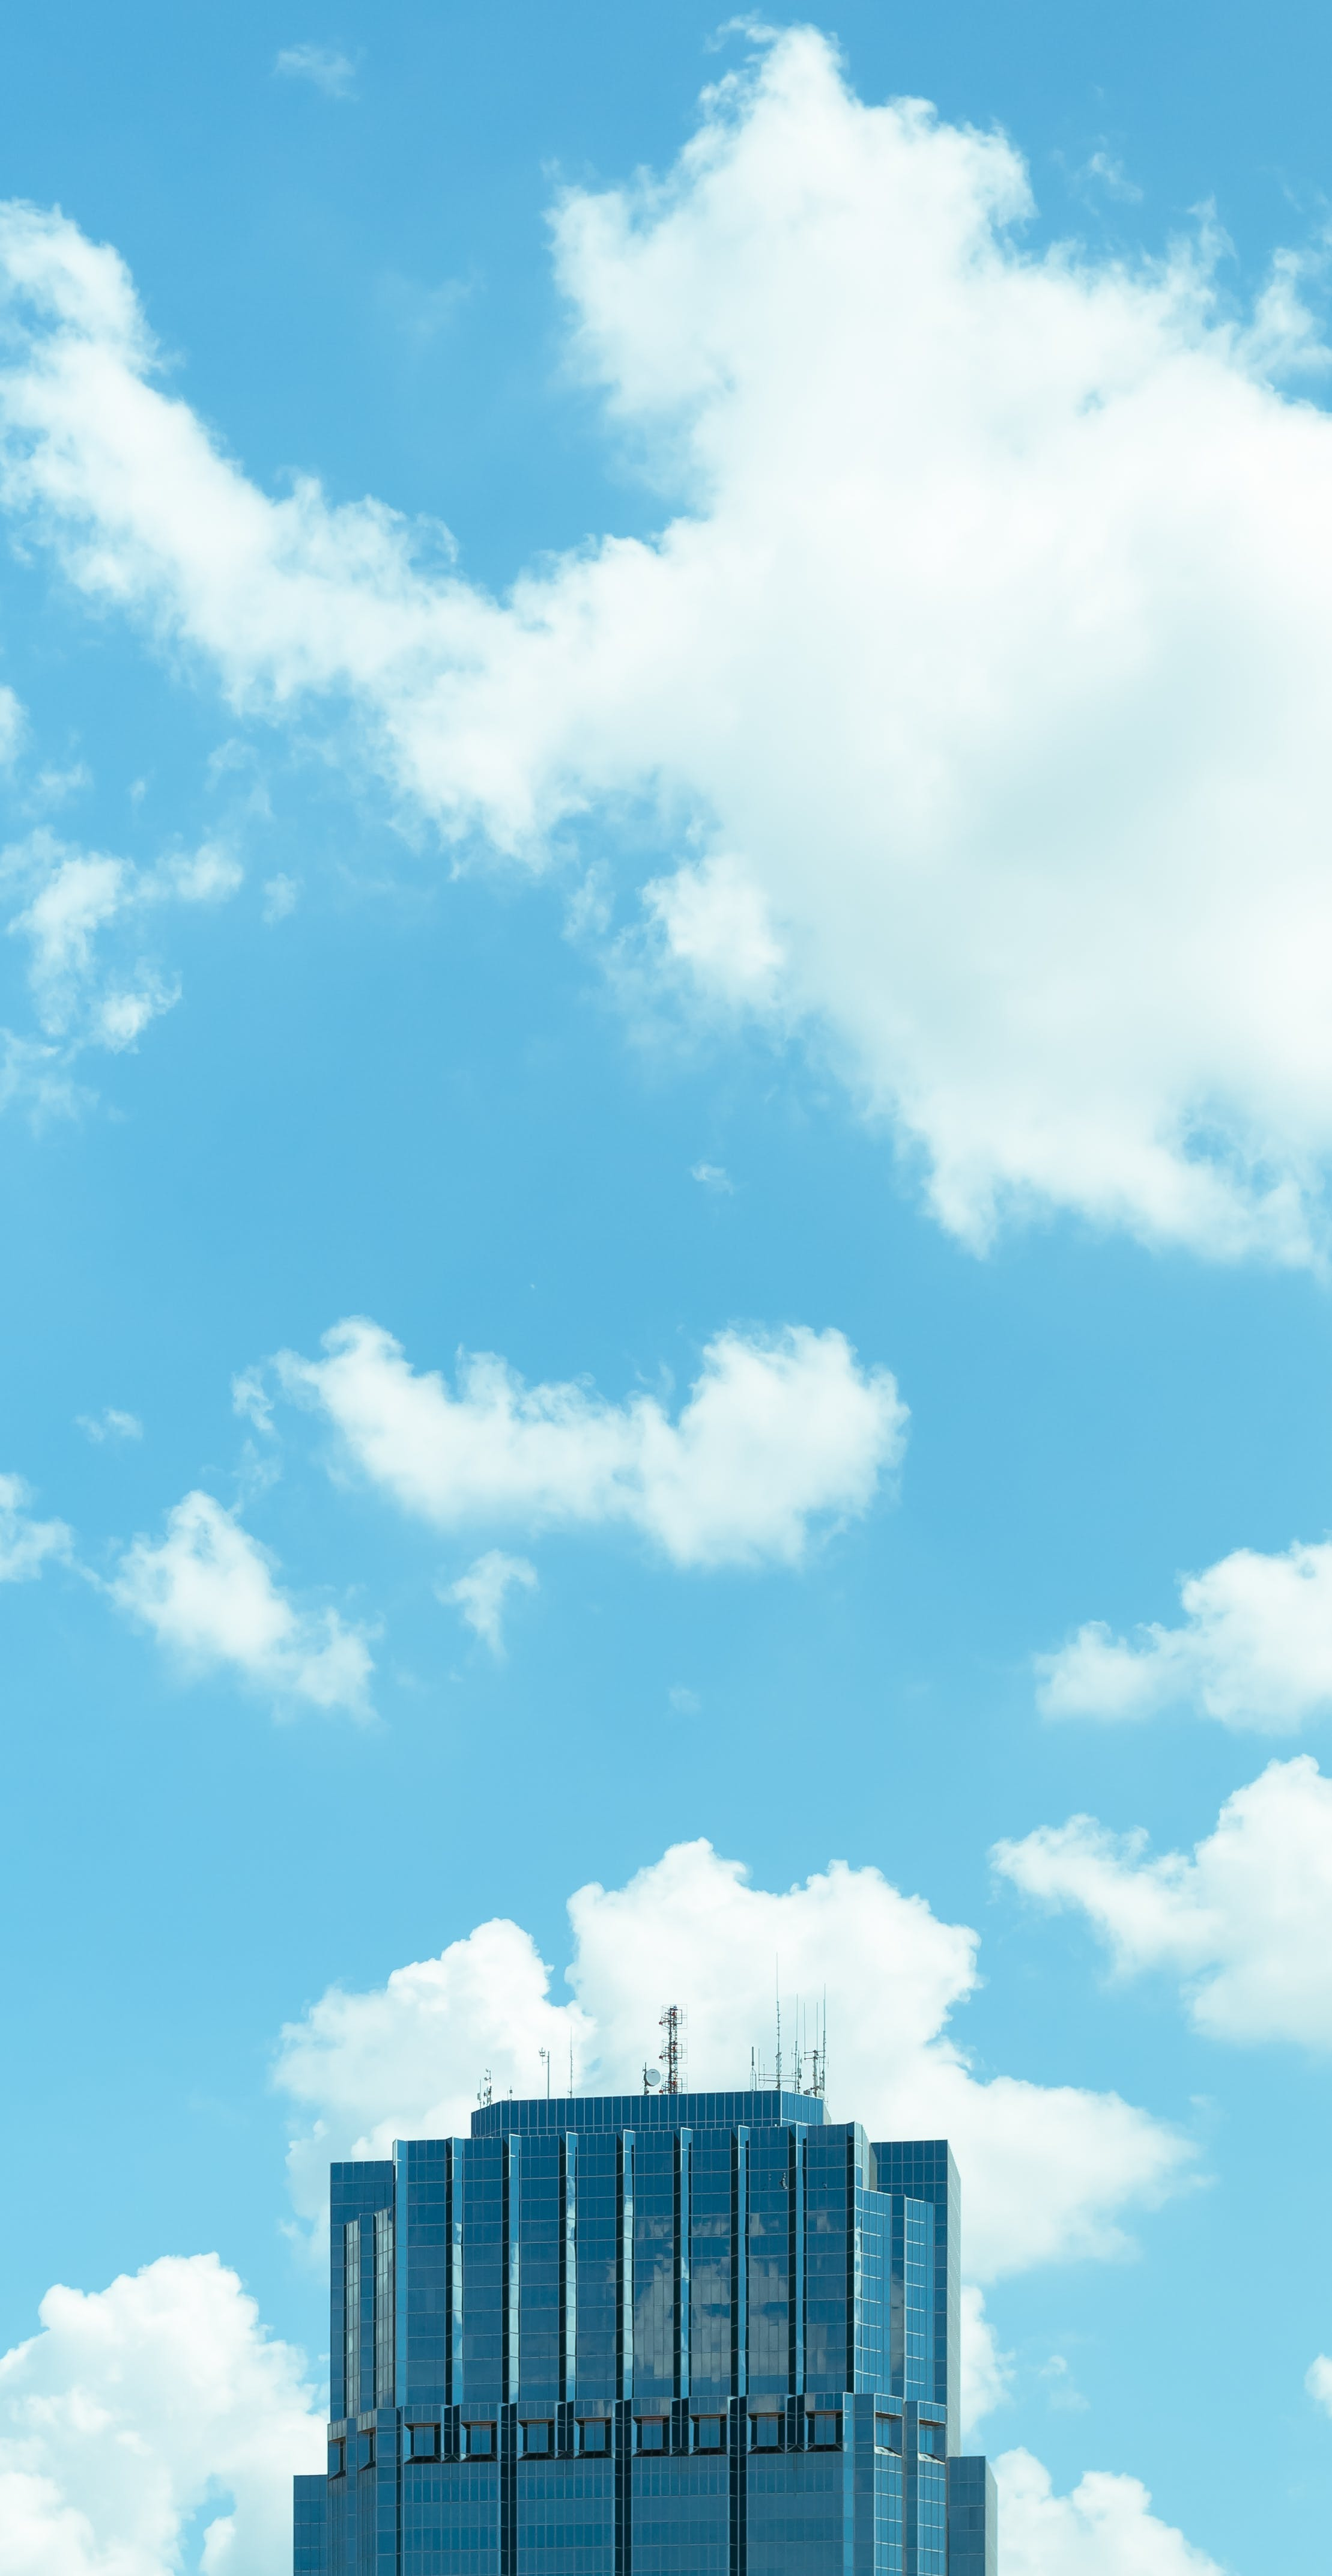 antenna, architecture, blue sky